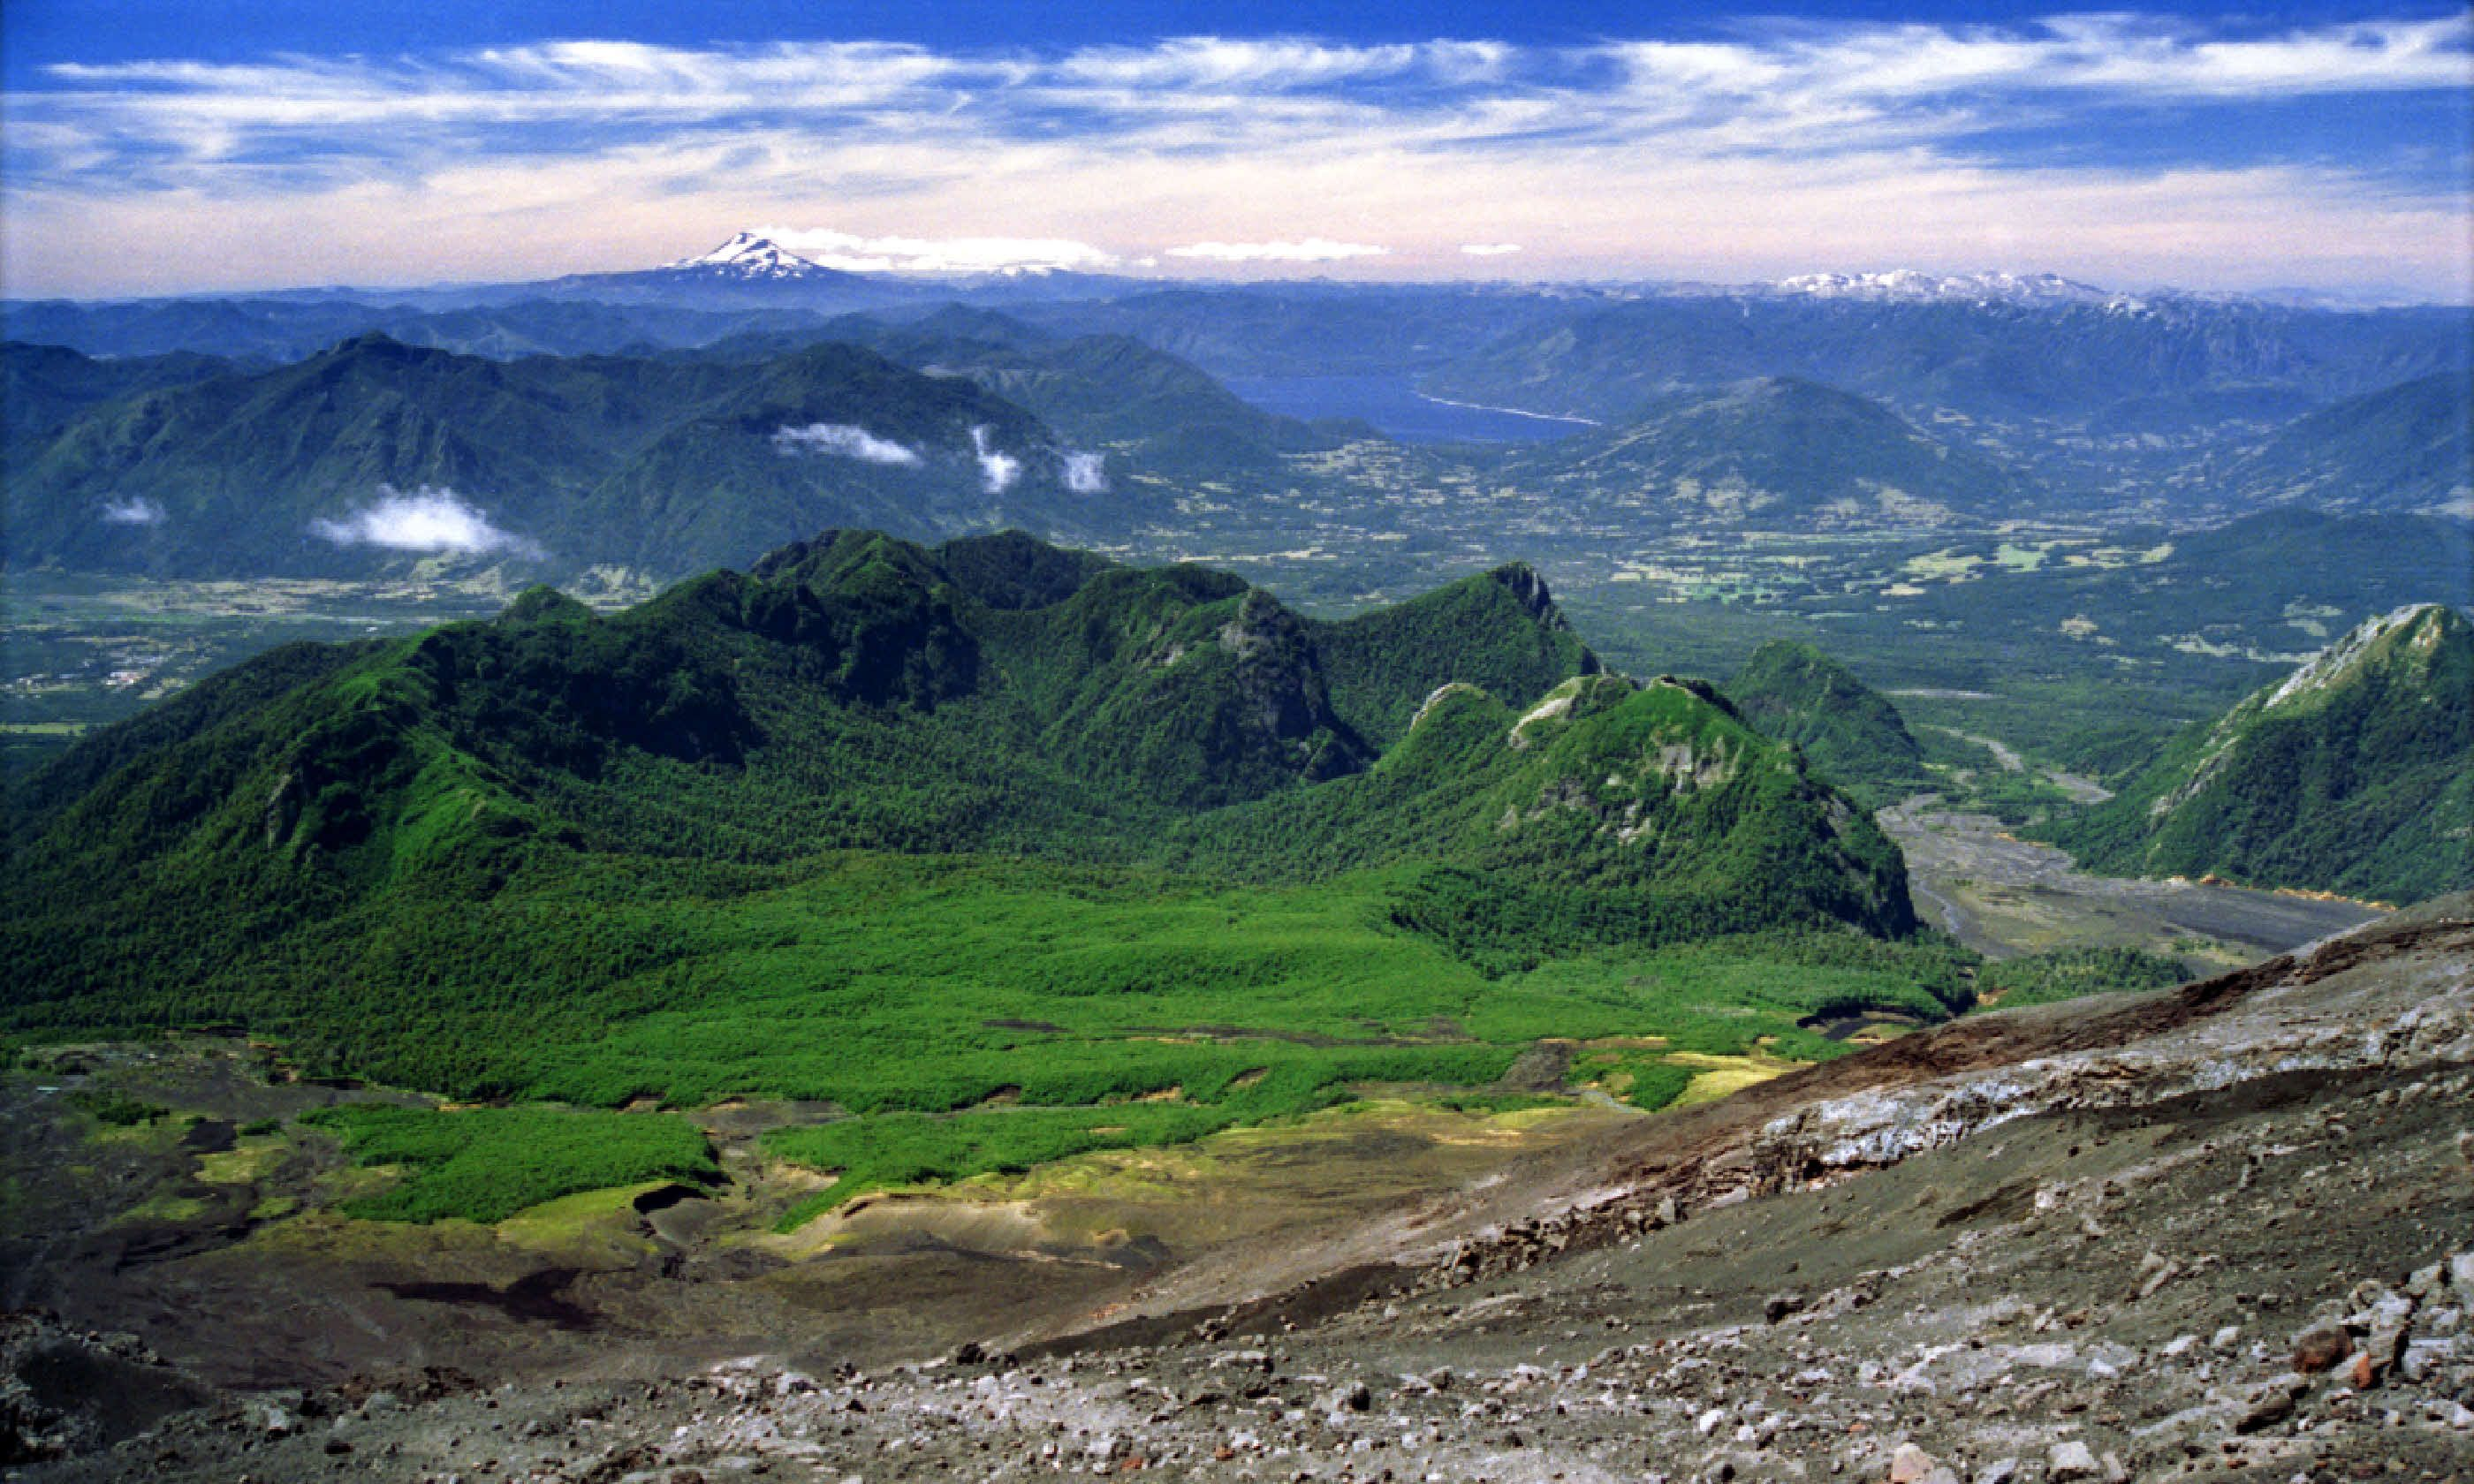 View from Villarrica volcano, Chile (Shutterstock)